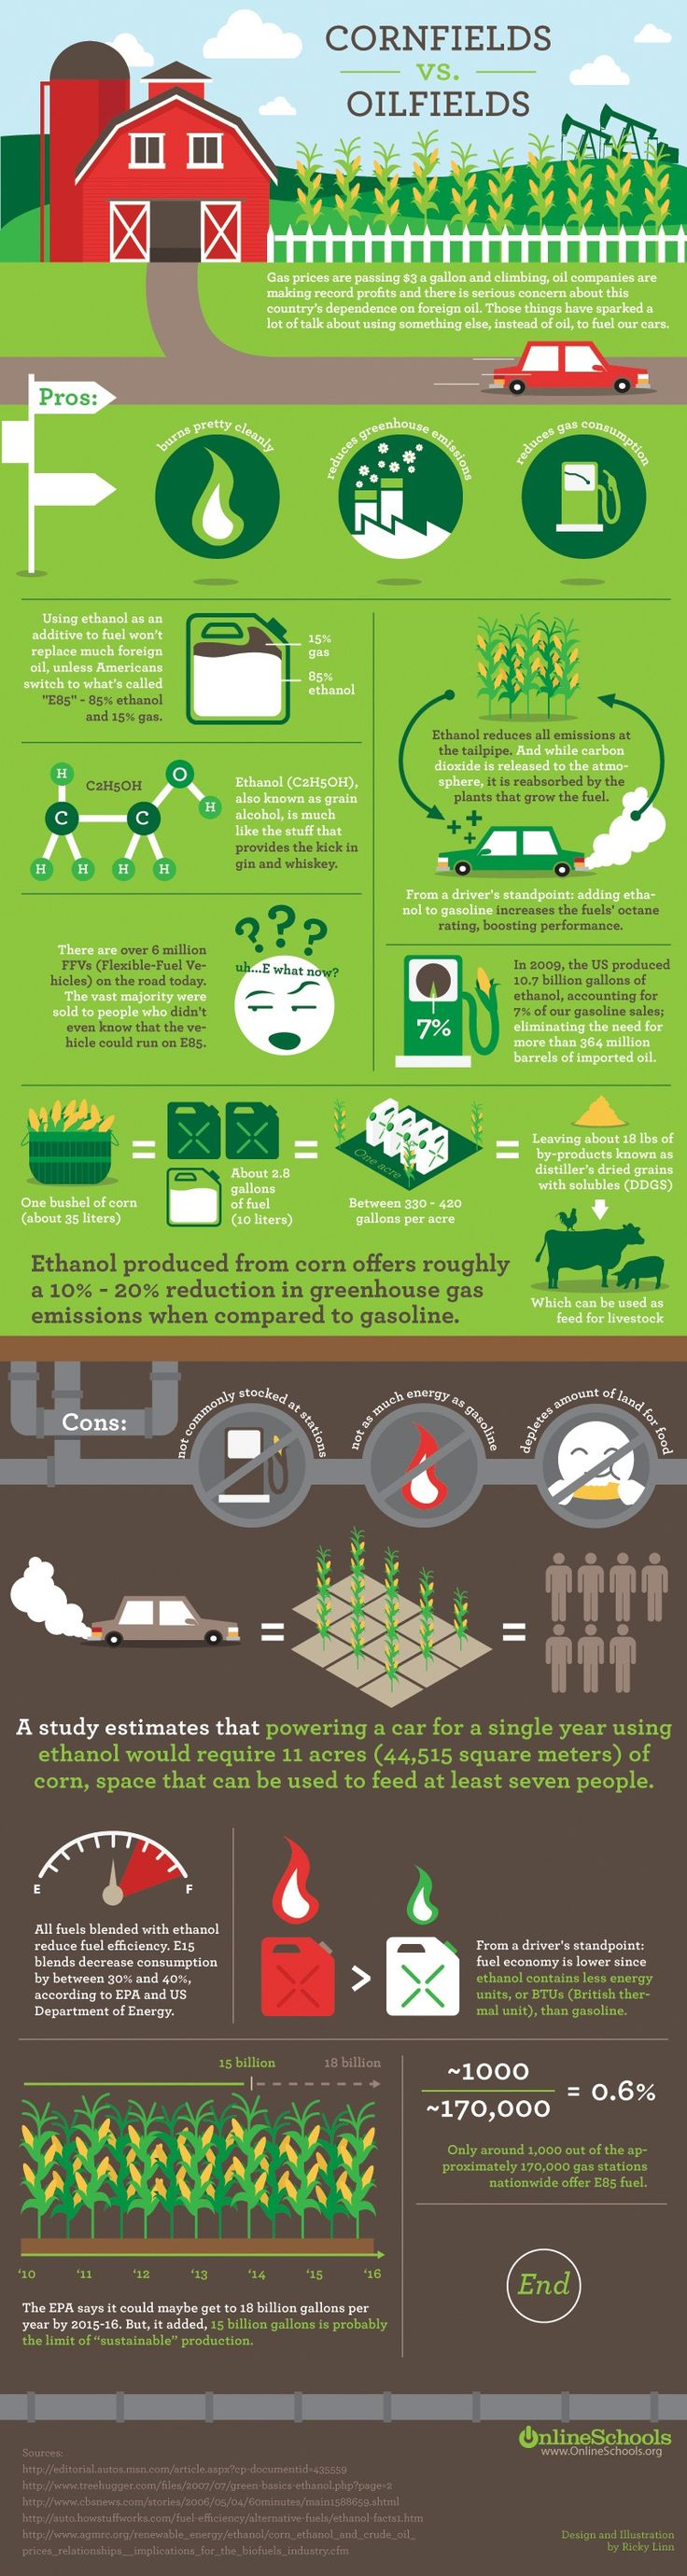 [Cornfields VS. Oilfields]    http://ecopolitology.org/2011/02/01/cornfields-vs-oilfields-infographic/